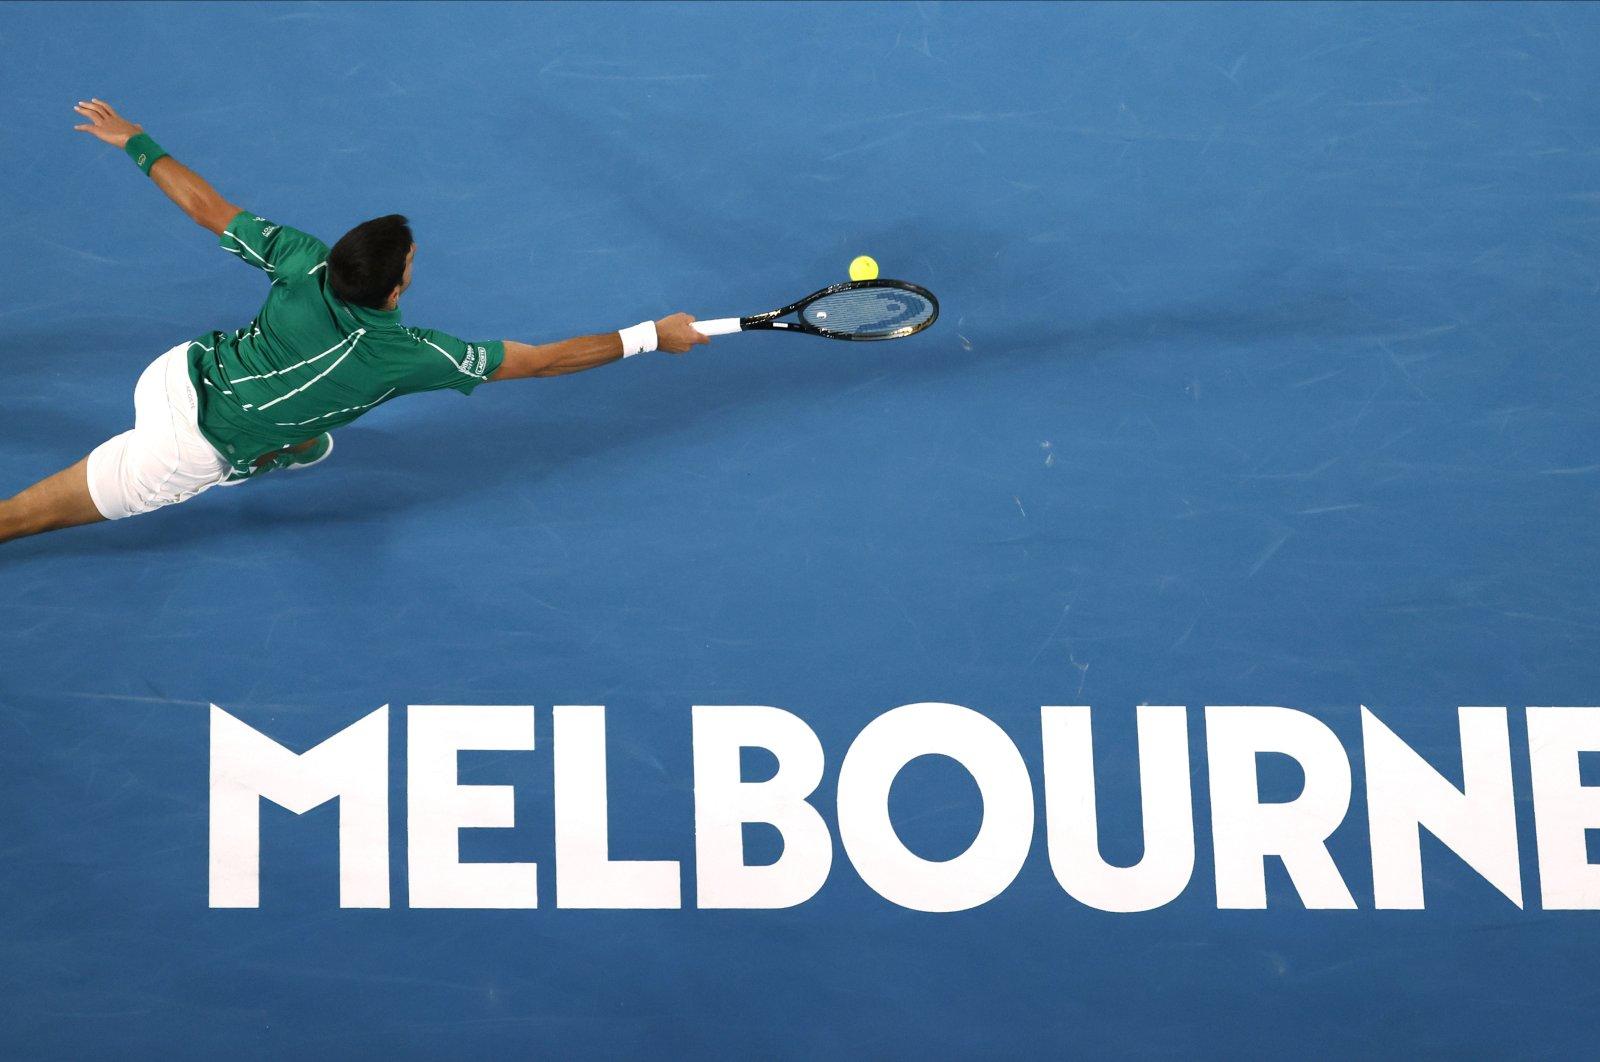 Novak Djokovic makes a forehand return to Dominic Thiem at the Australian Open in Melbourne, Australia, Feb. 2, 2020. (AP Photo)